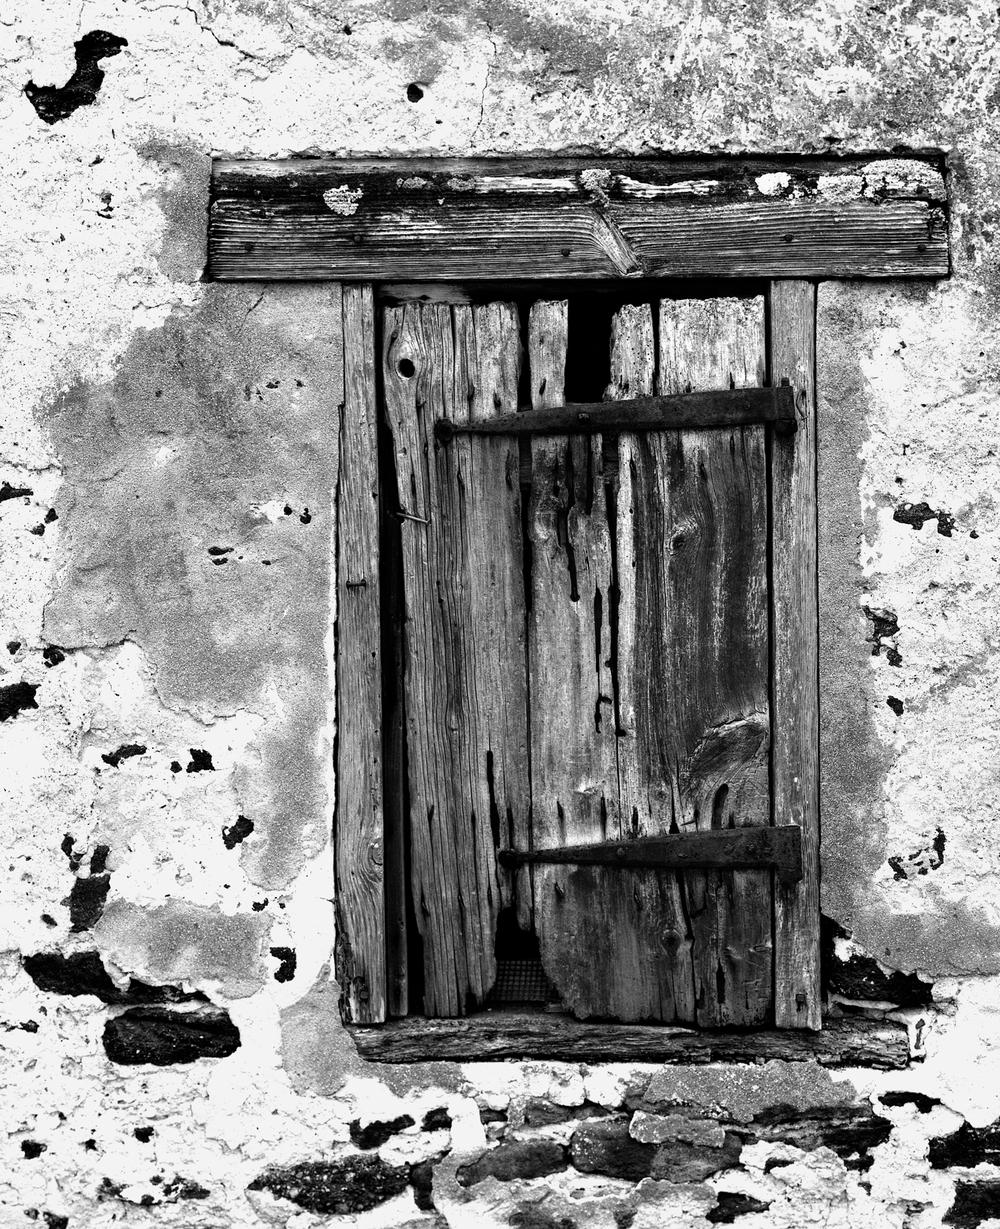 4x5_for_365_project_0149_Batsto_Village_hinged_window.jpg